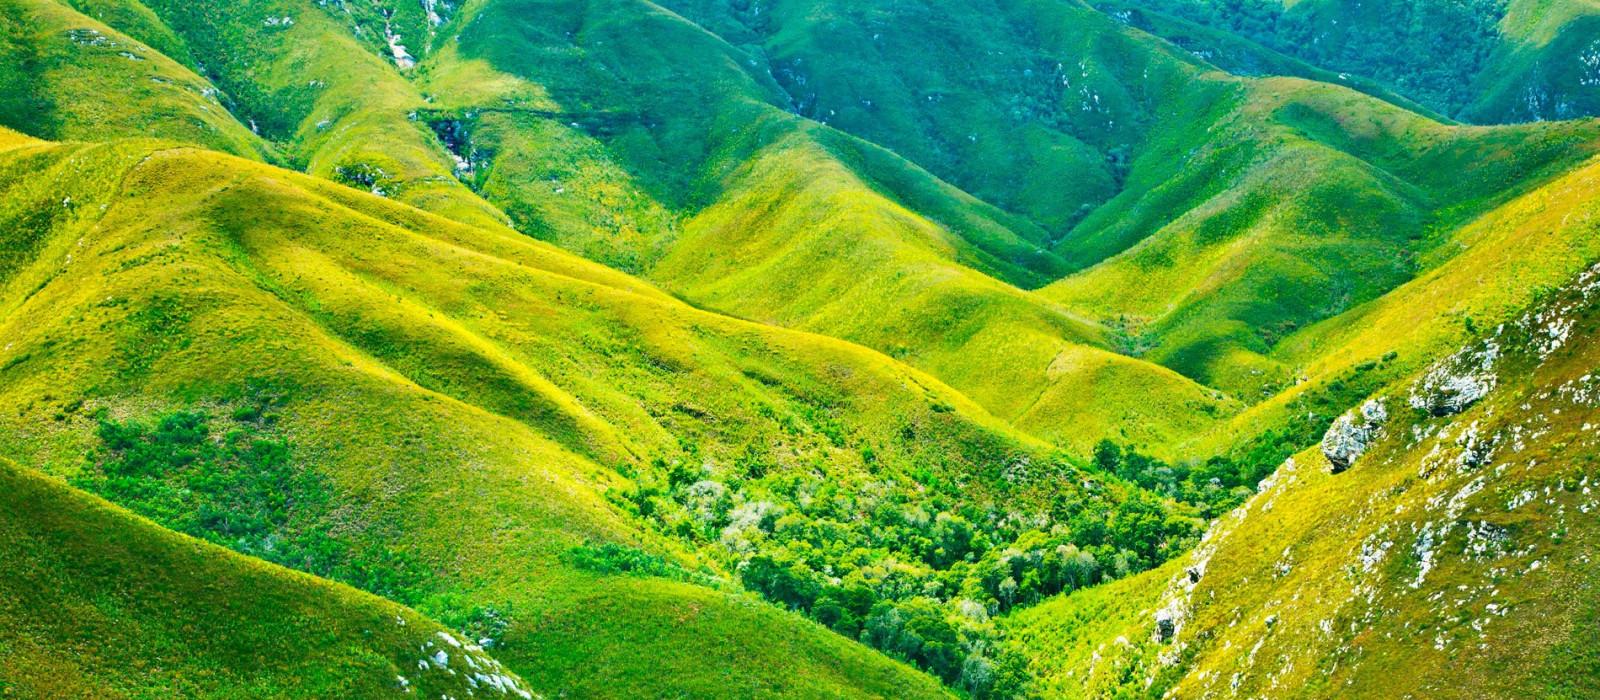 Reiseziel Garden Route Südafrika